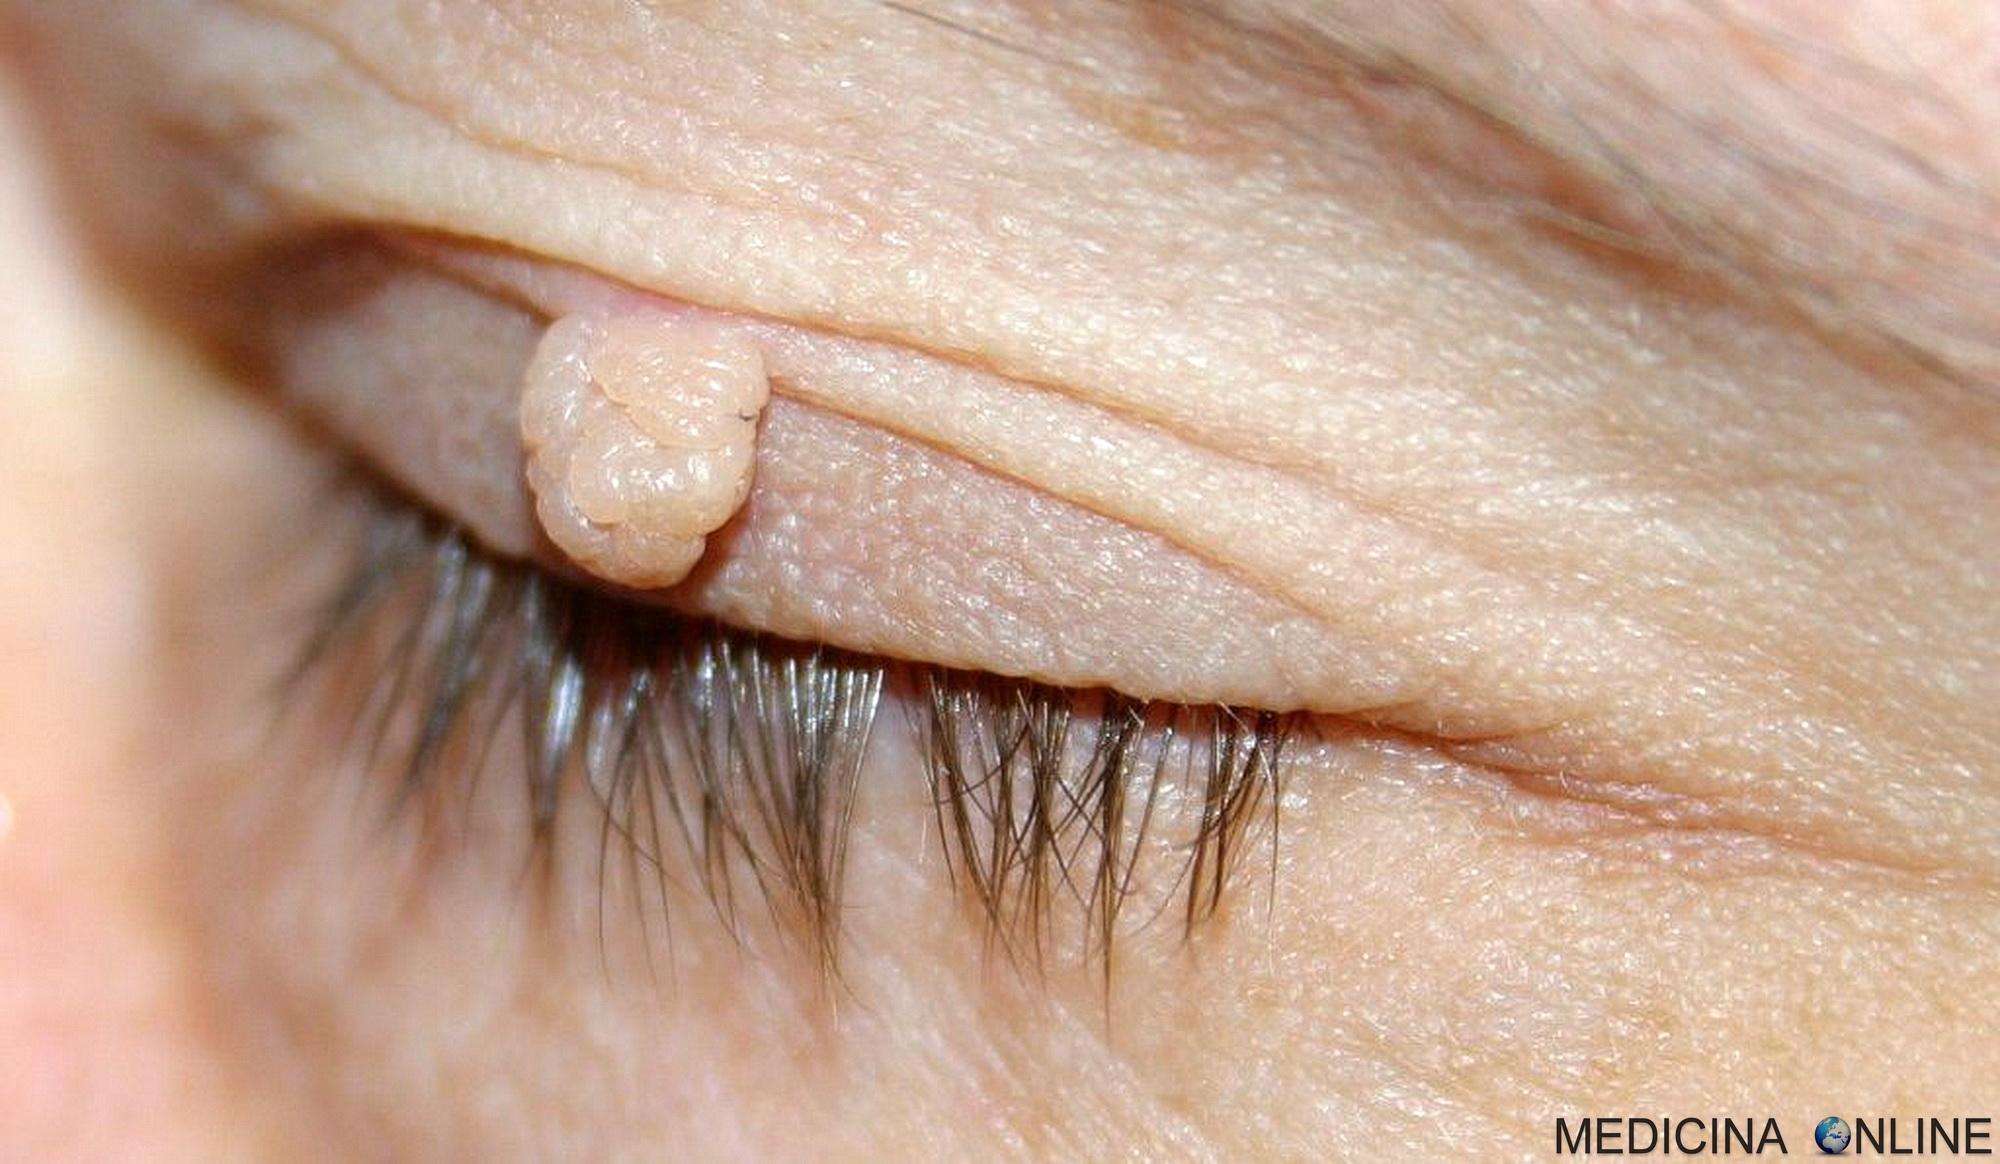 Papilloma occhio sintomi Papilloma occhio